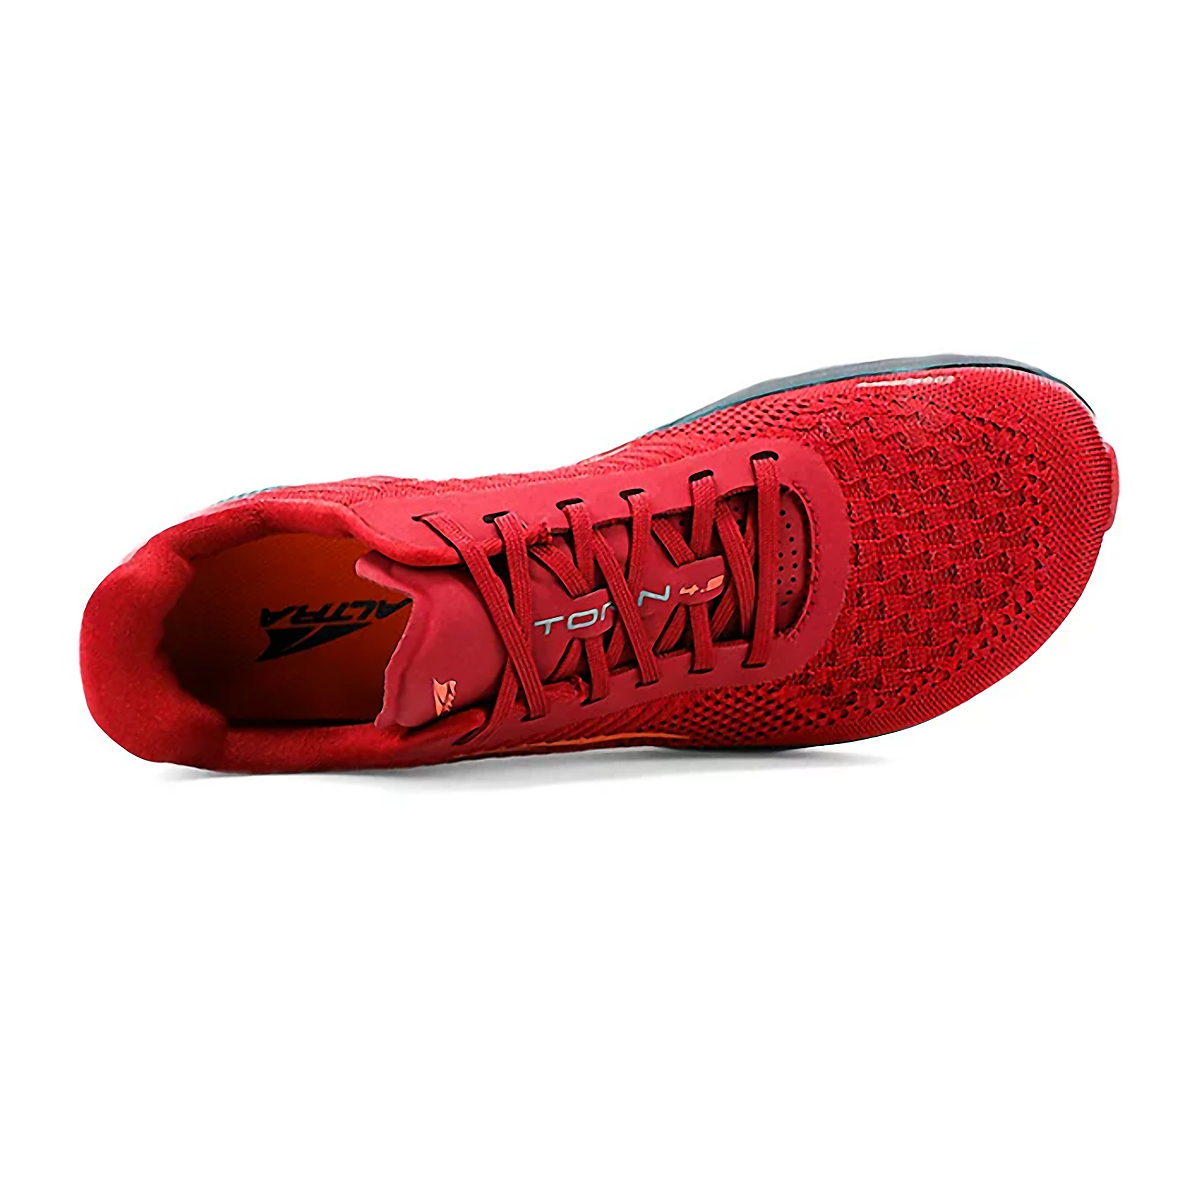 Men's Altra Torin 4.5 Plush Running Shoe - Color: Dark Red - Size: 7 - Width: Regular, Dark Red, large, image 3